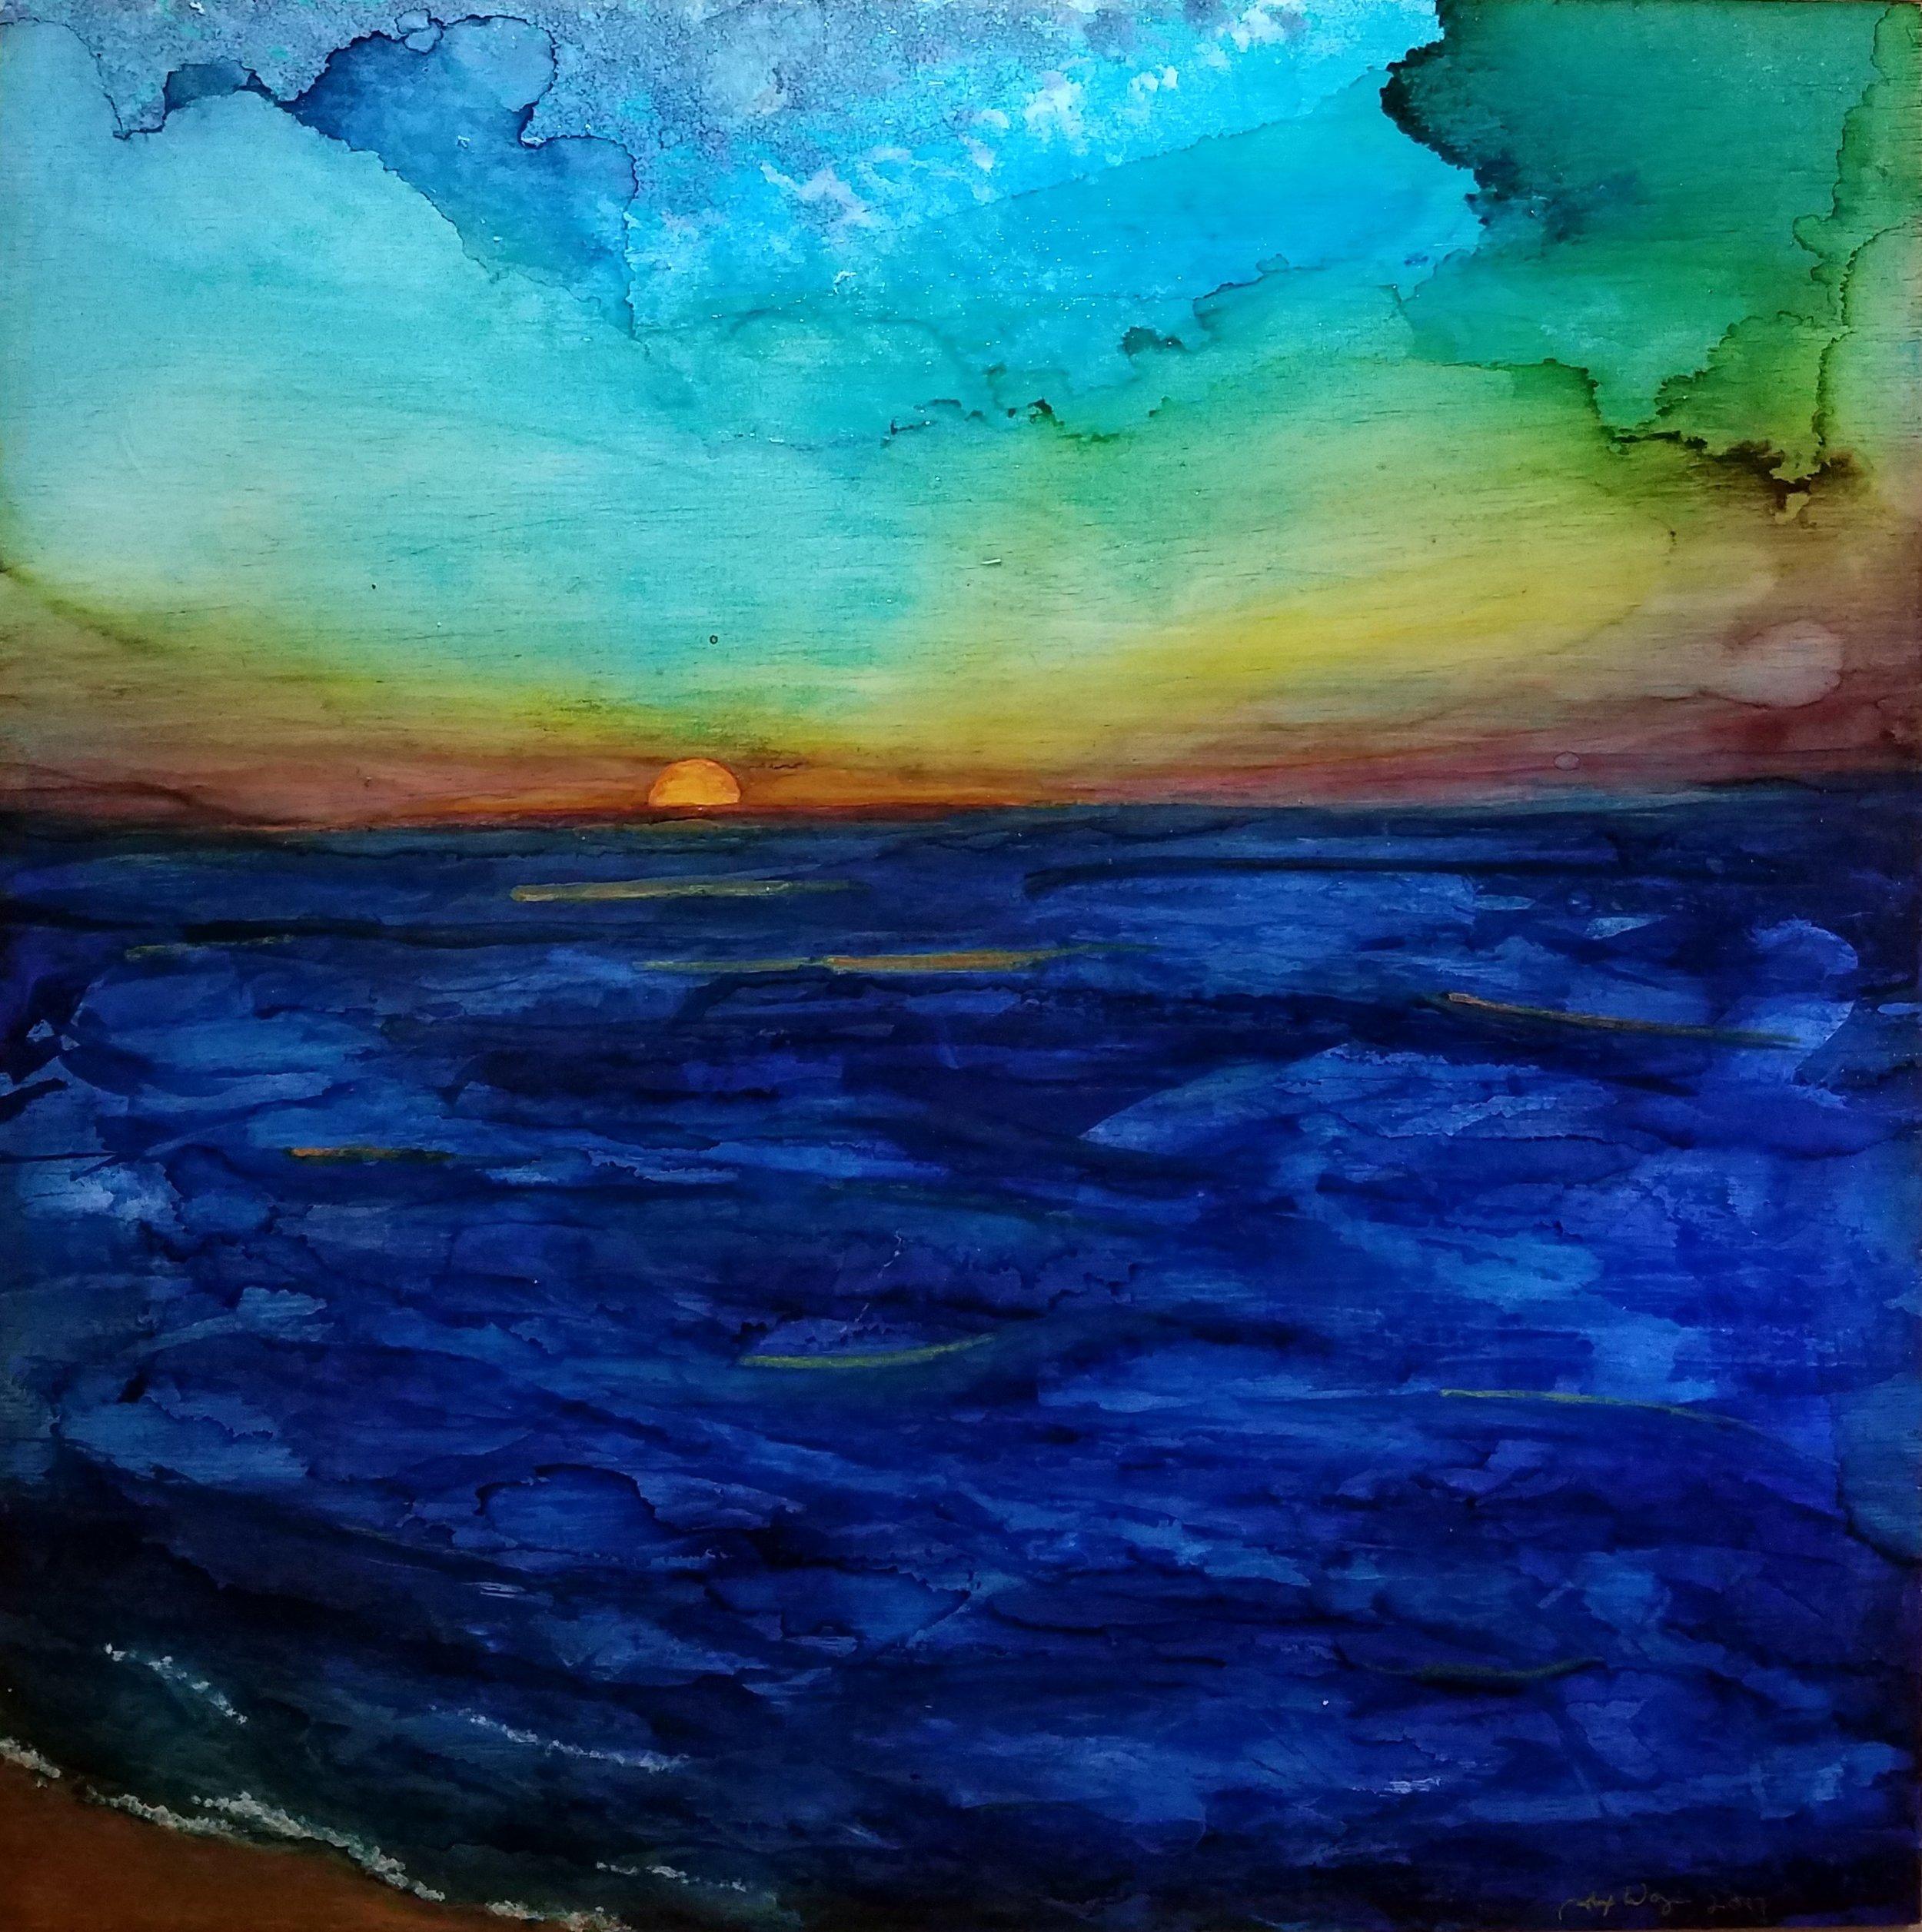 Sunset Seacape #1.jpg